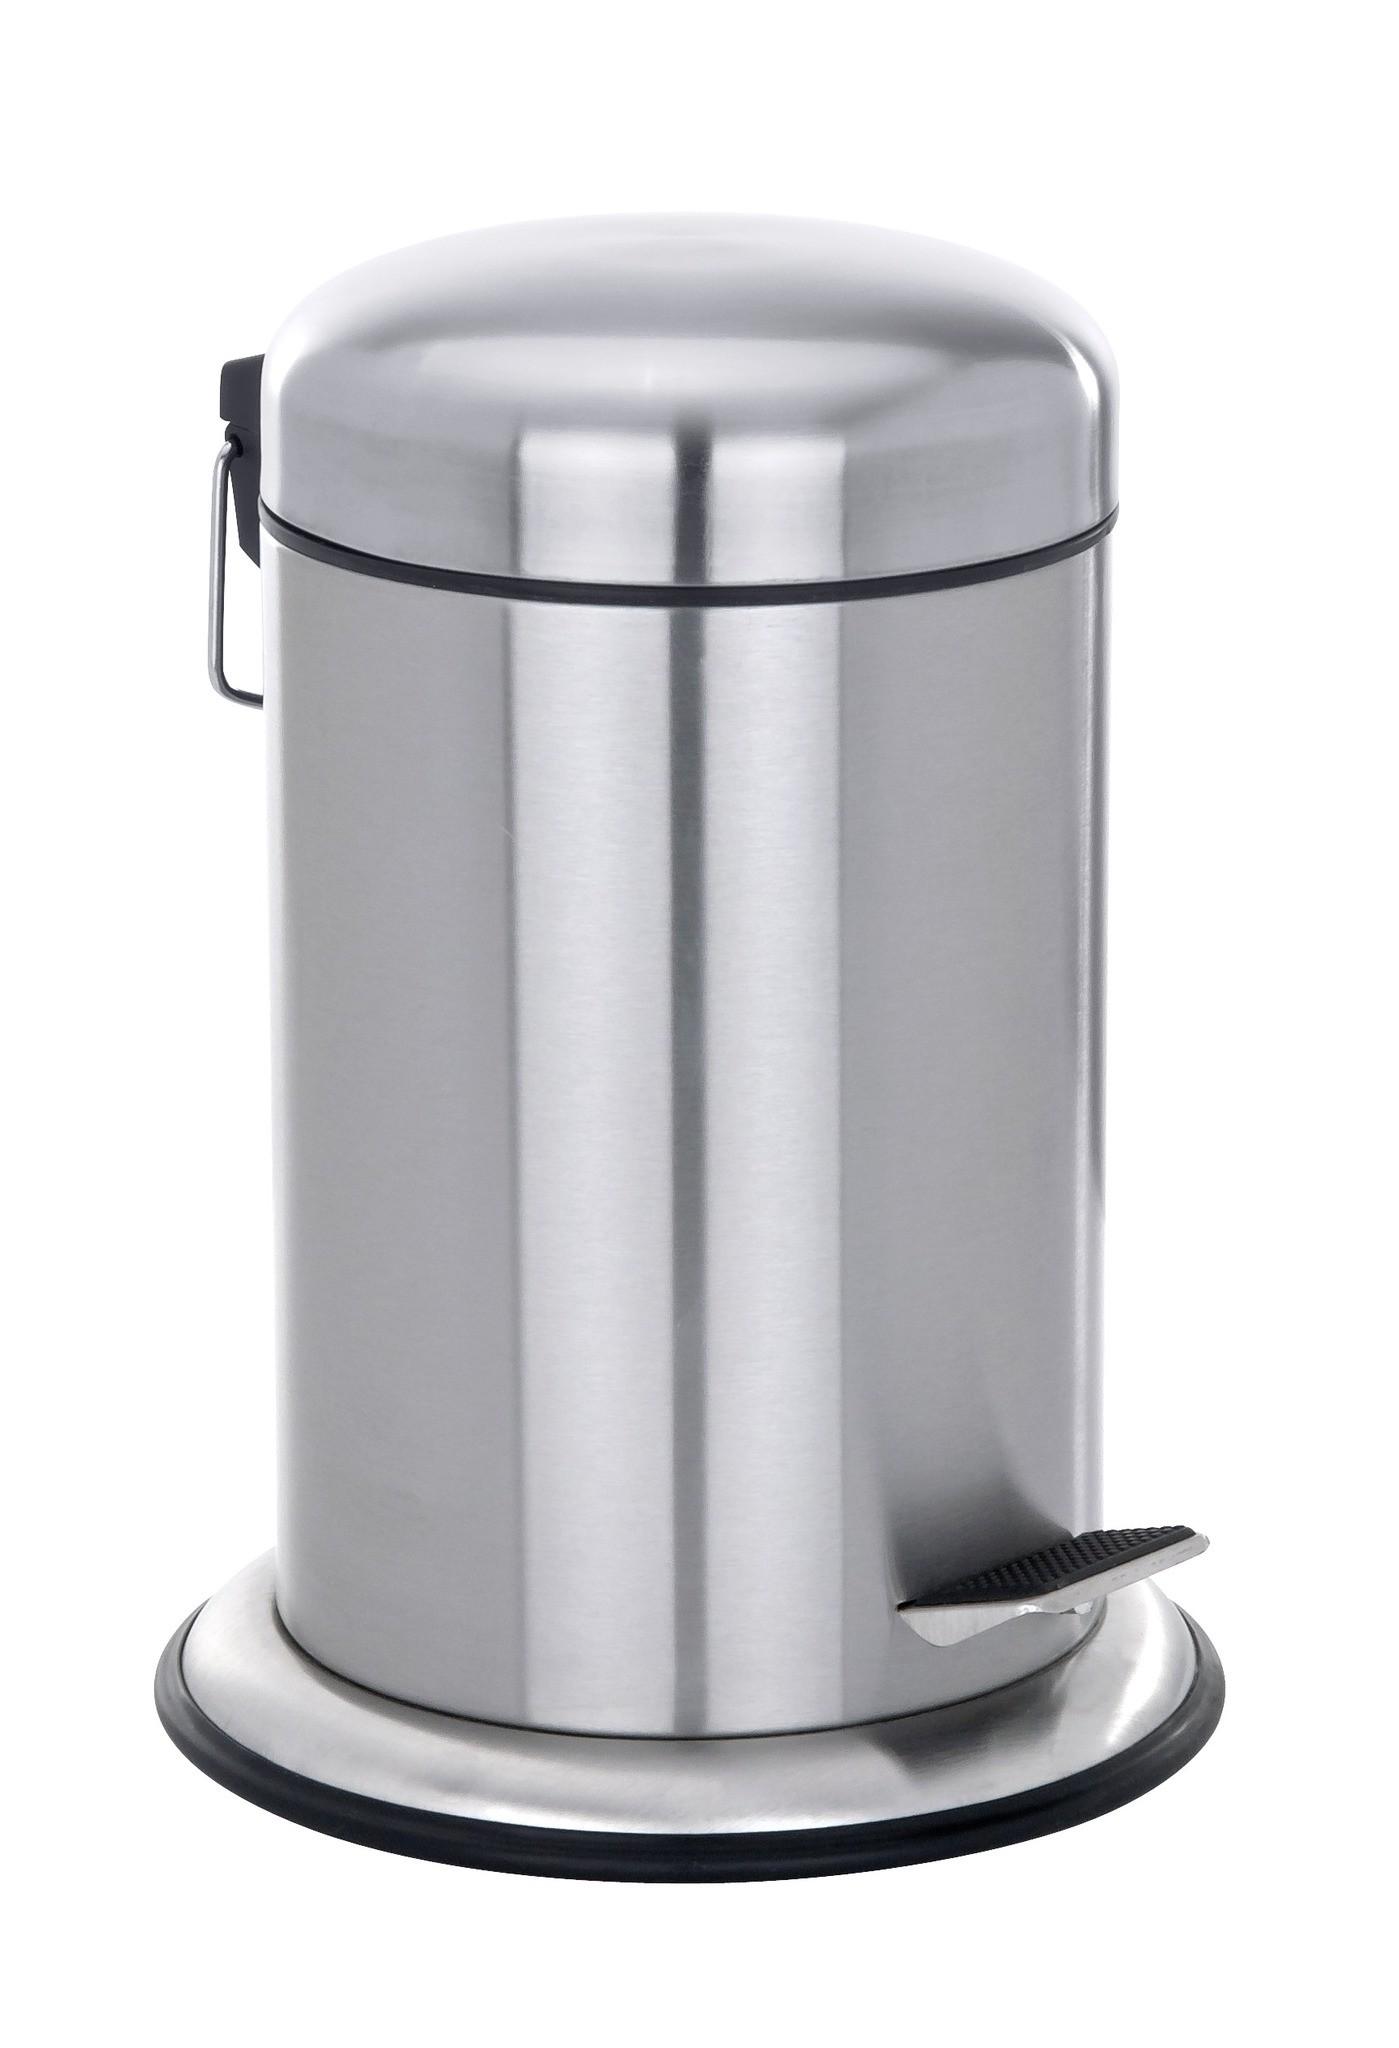 Treteimer Nova, Edelstahl rostfrei, 3 Liter